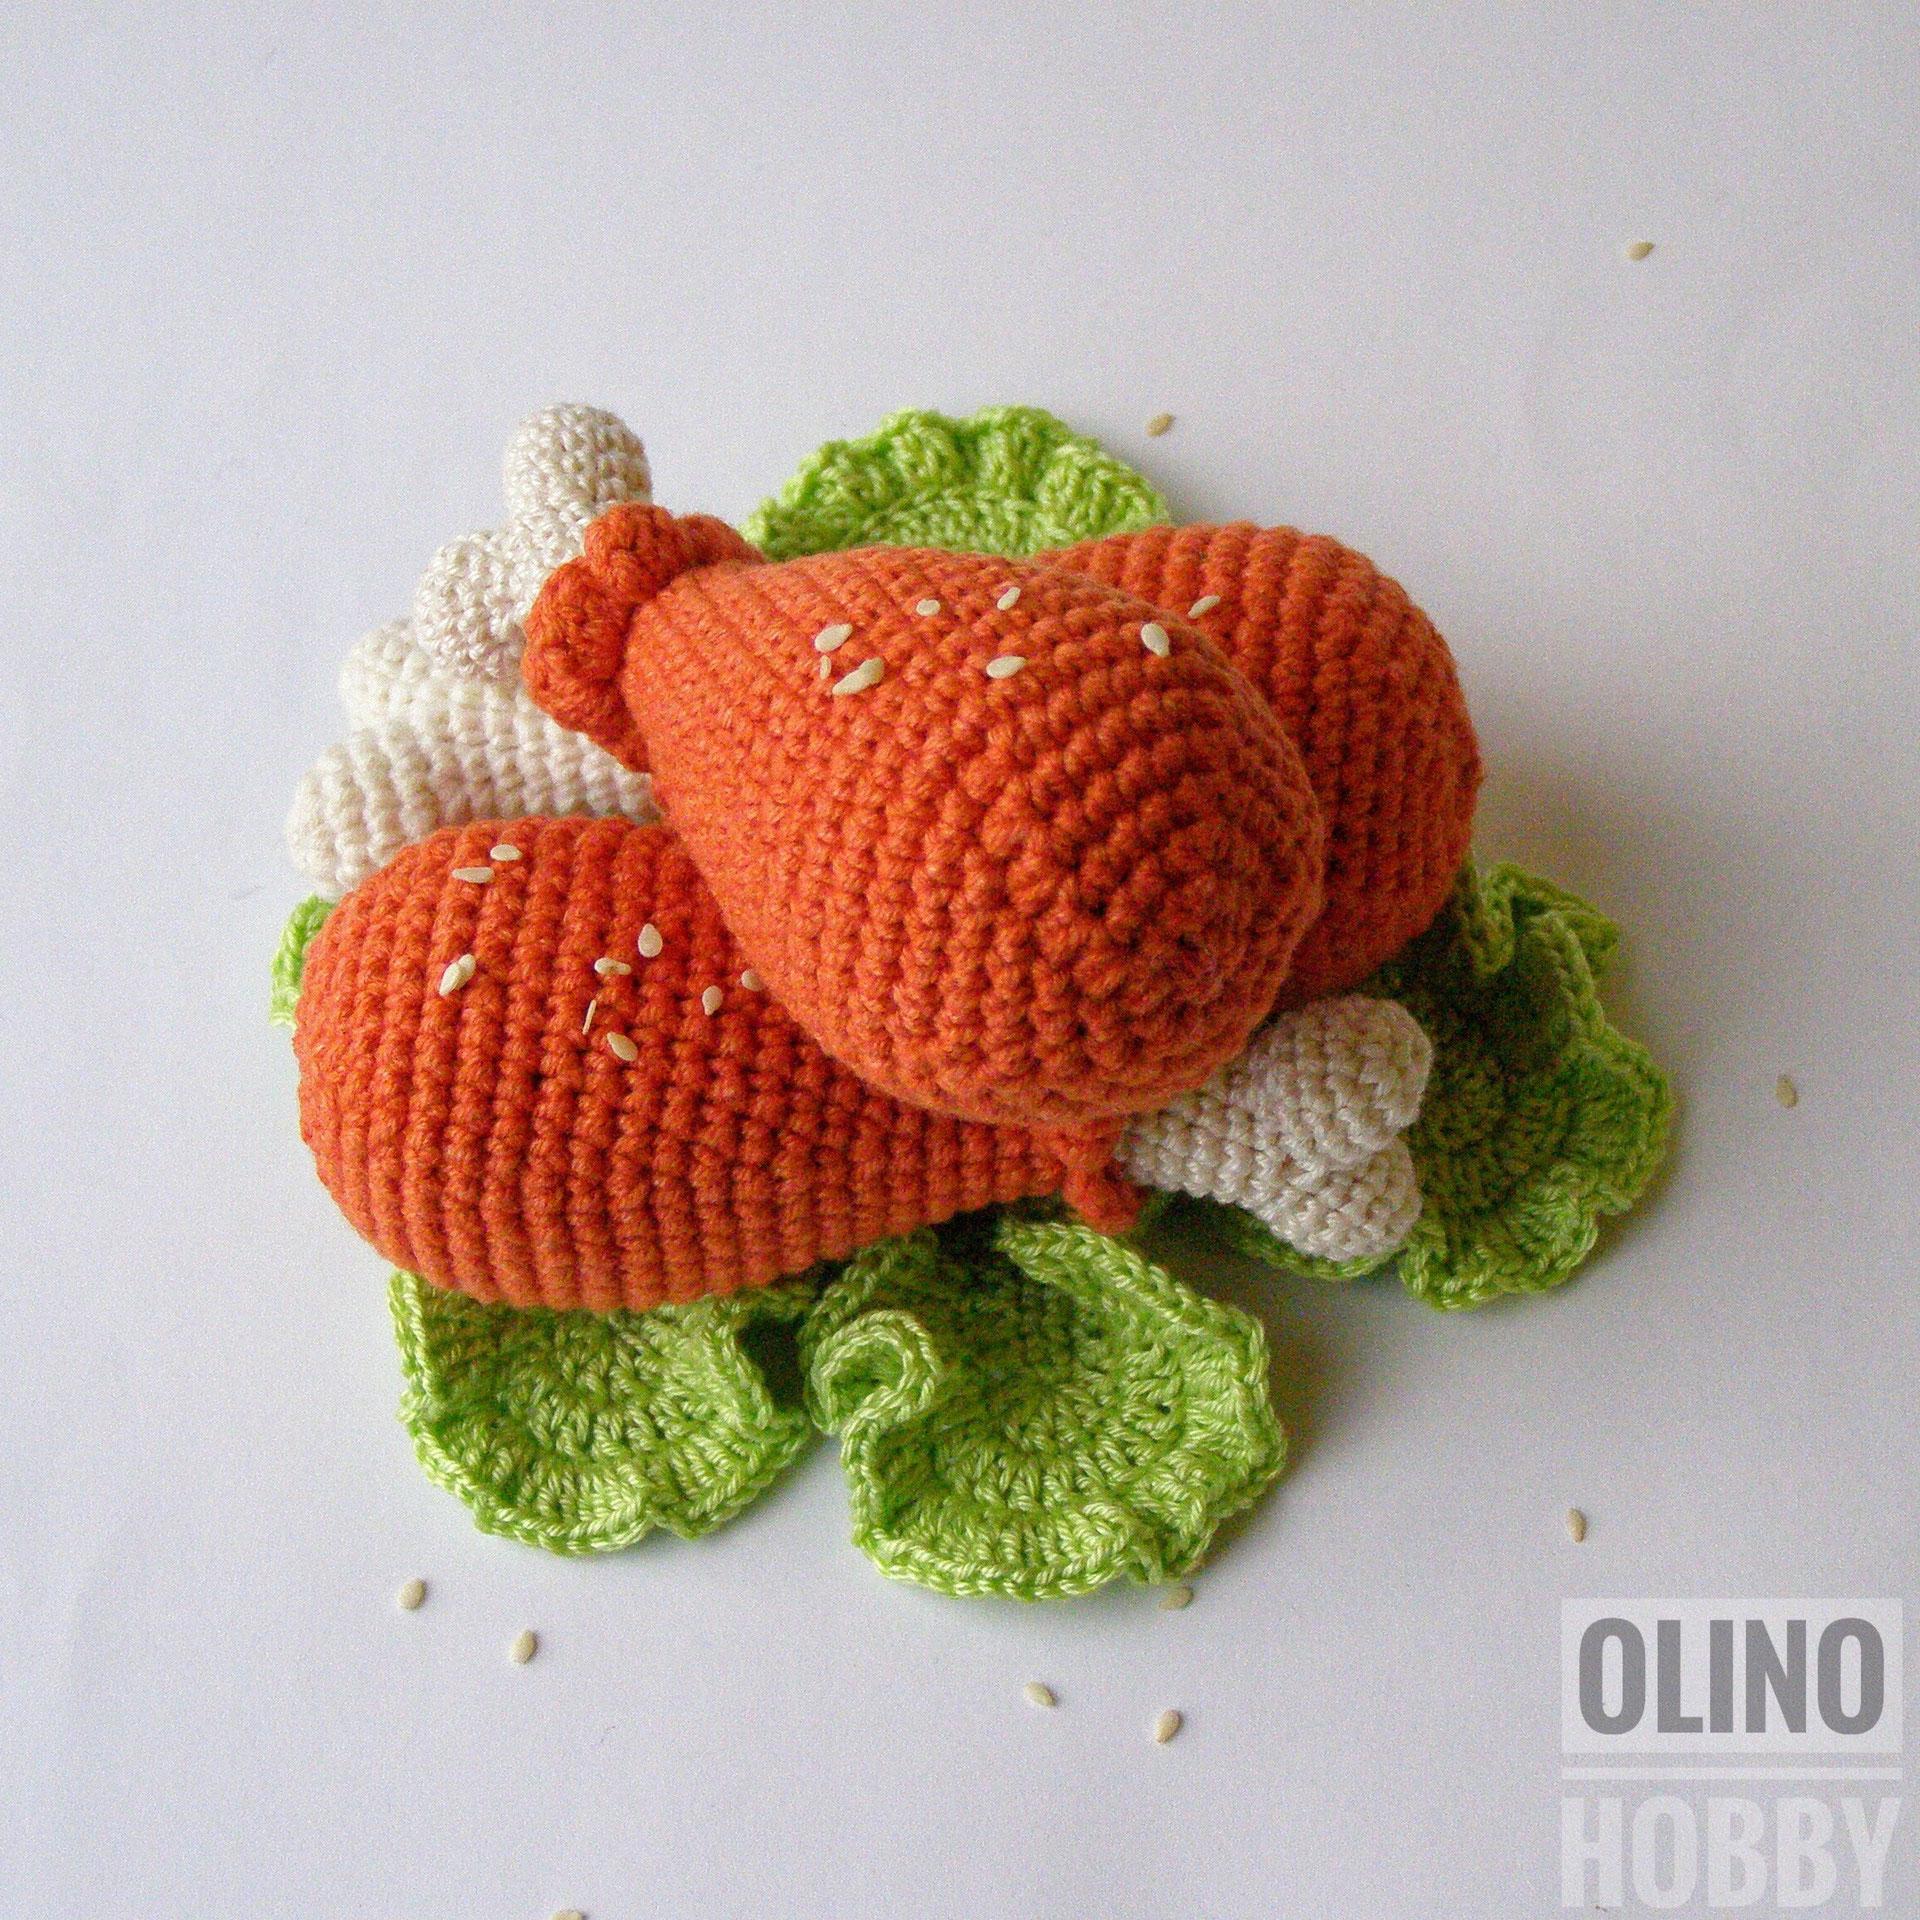 Fried Chicken Legs Crochet Patterns - OlinoHobby